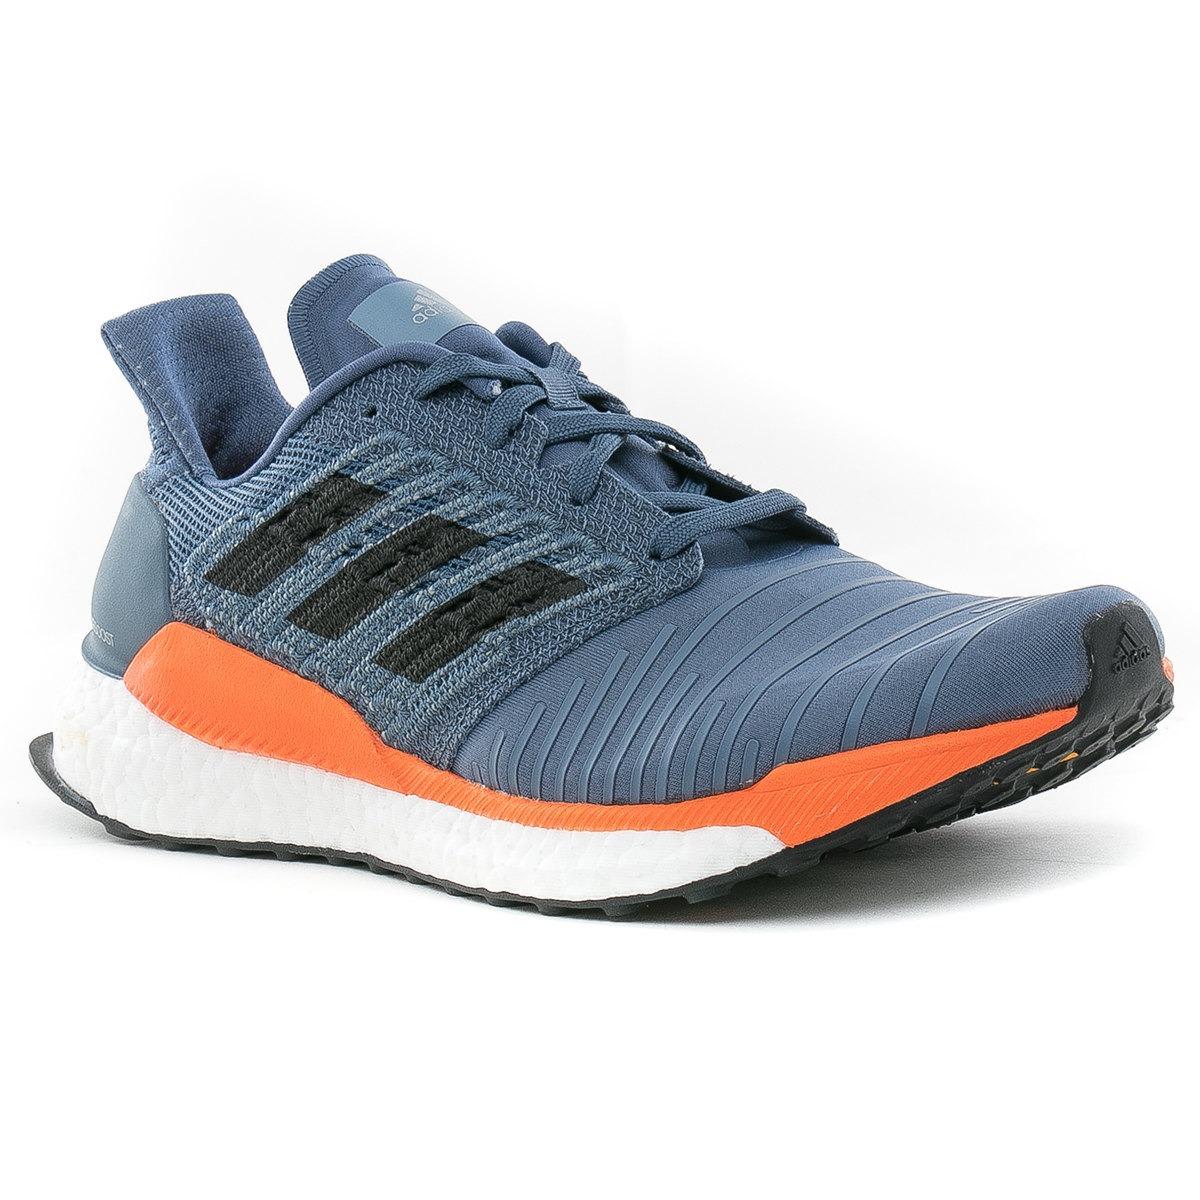 d9df9c14a ... mens adidas solar boost m dark grey running d83a3 40b2a  where can i  buy zapatillas solar boost m azul adidas. cargando zoom. 999e6 68152